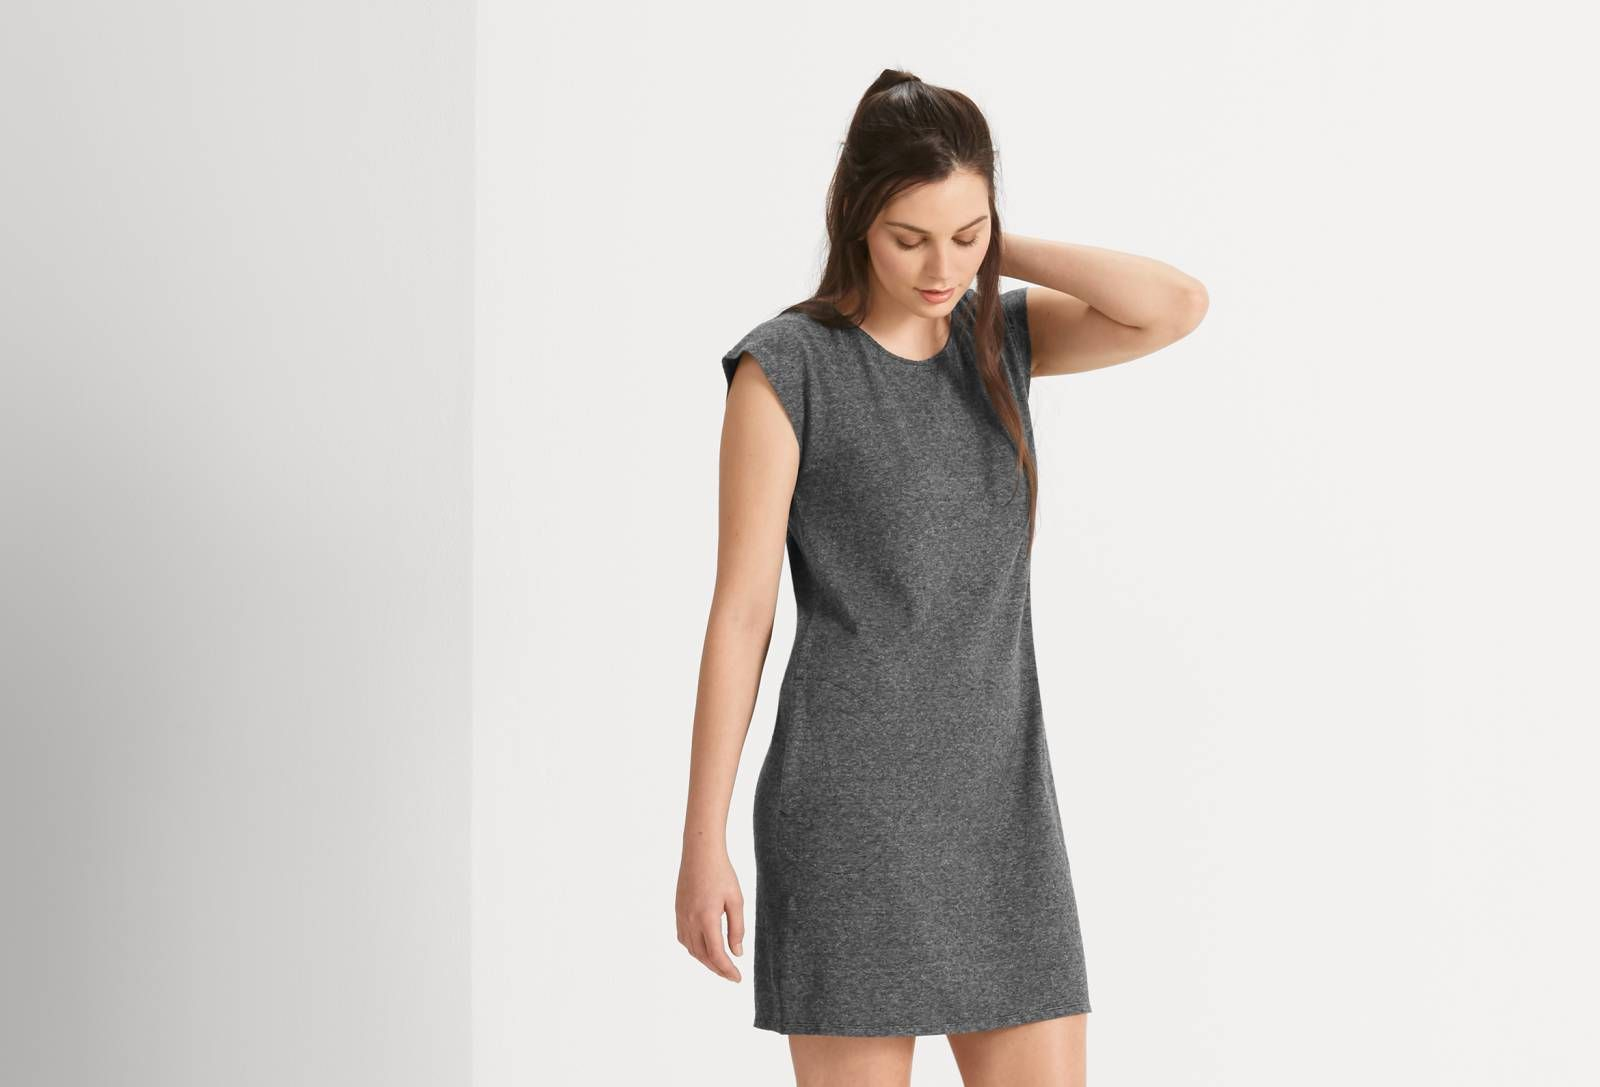 Ss kanab tshirt dress clothes pinterest simple designs mid